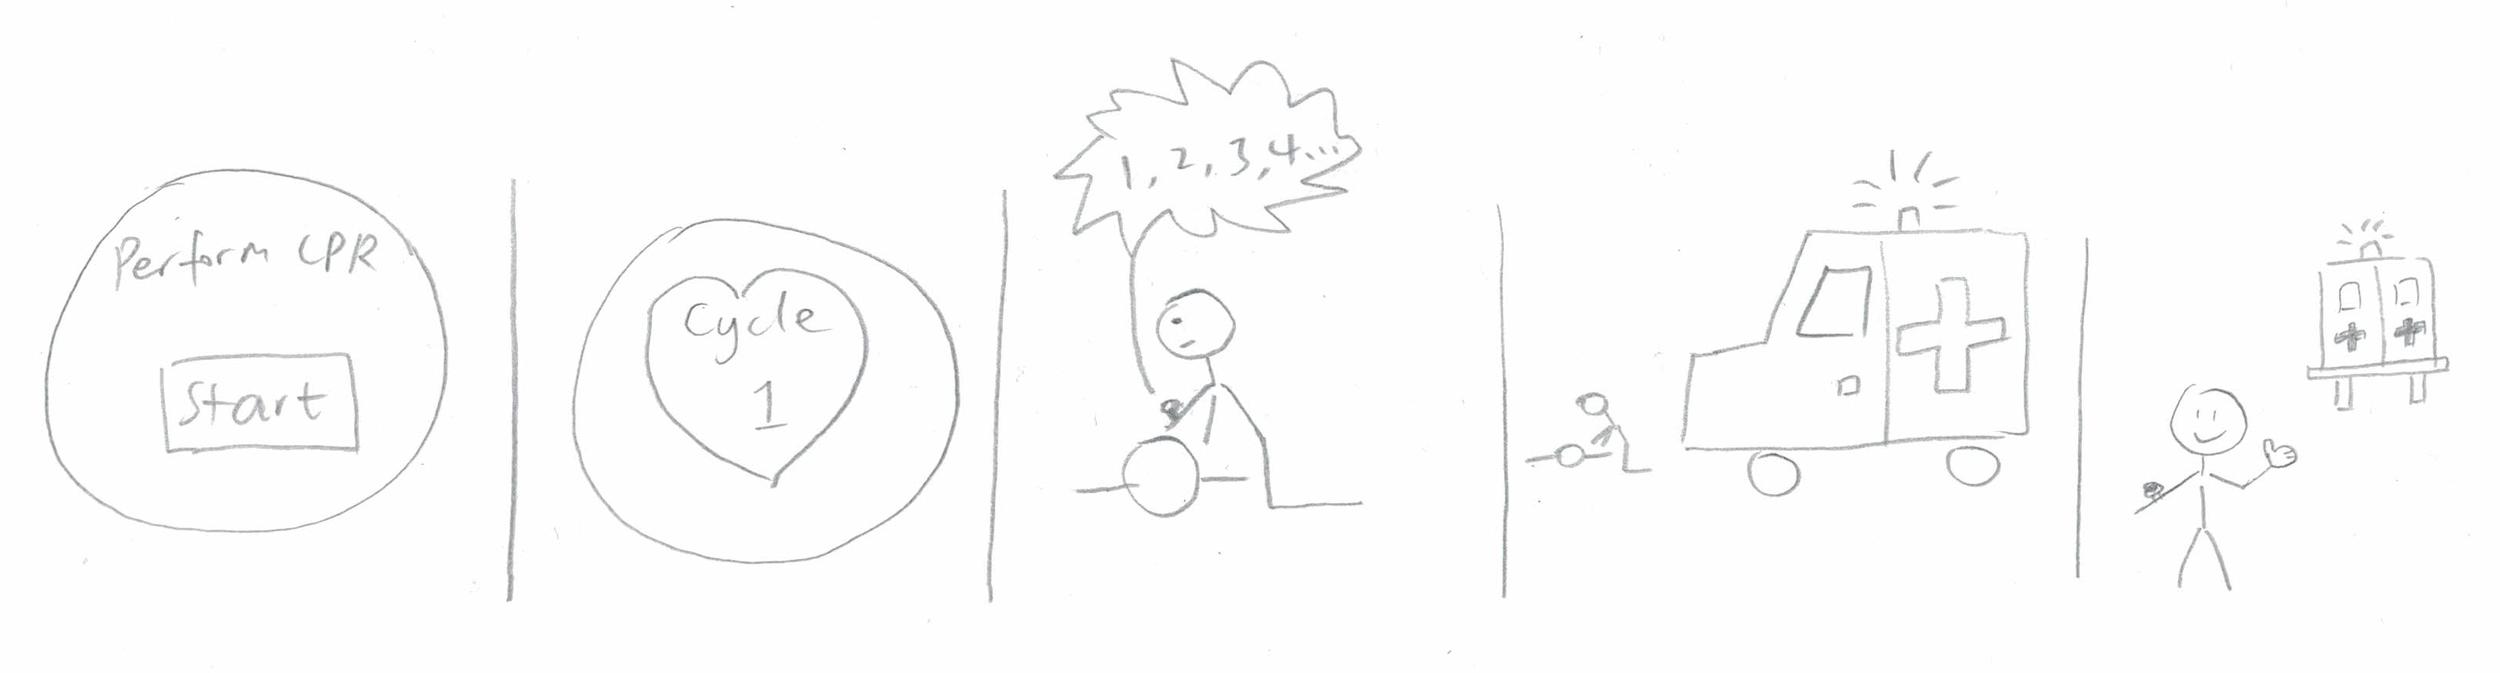 three-tasks.png